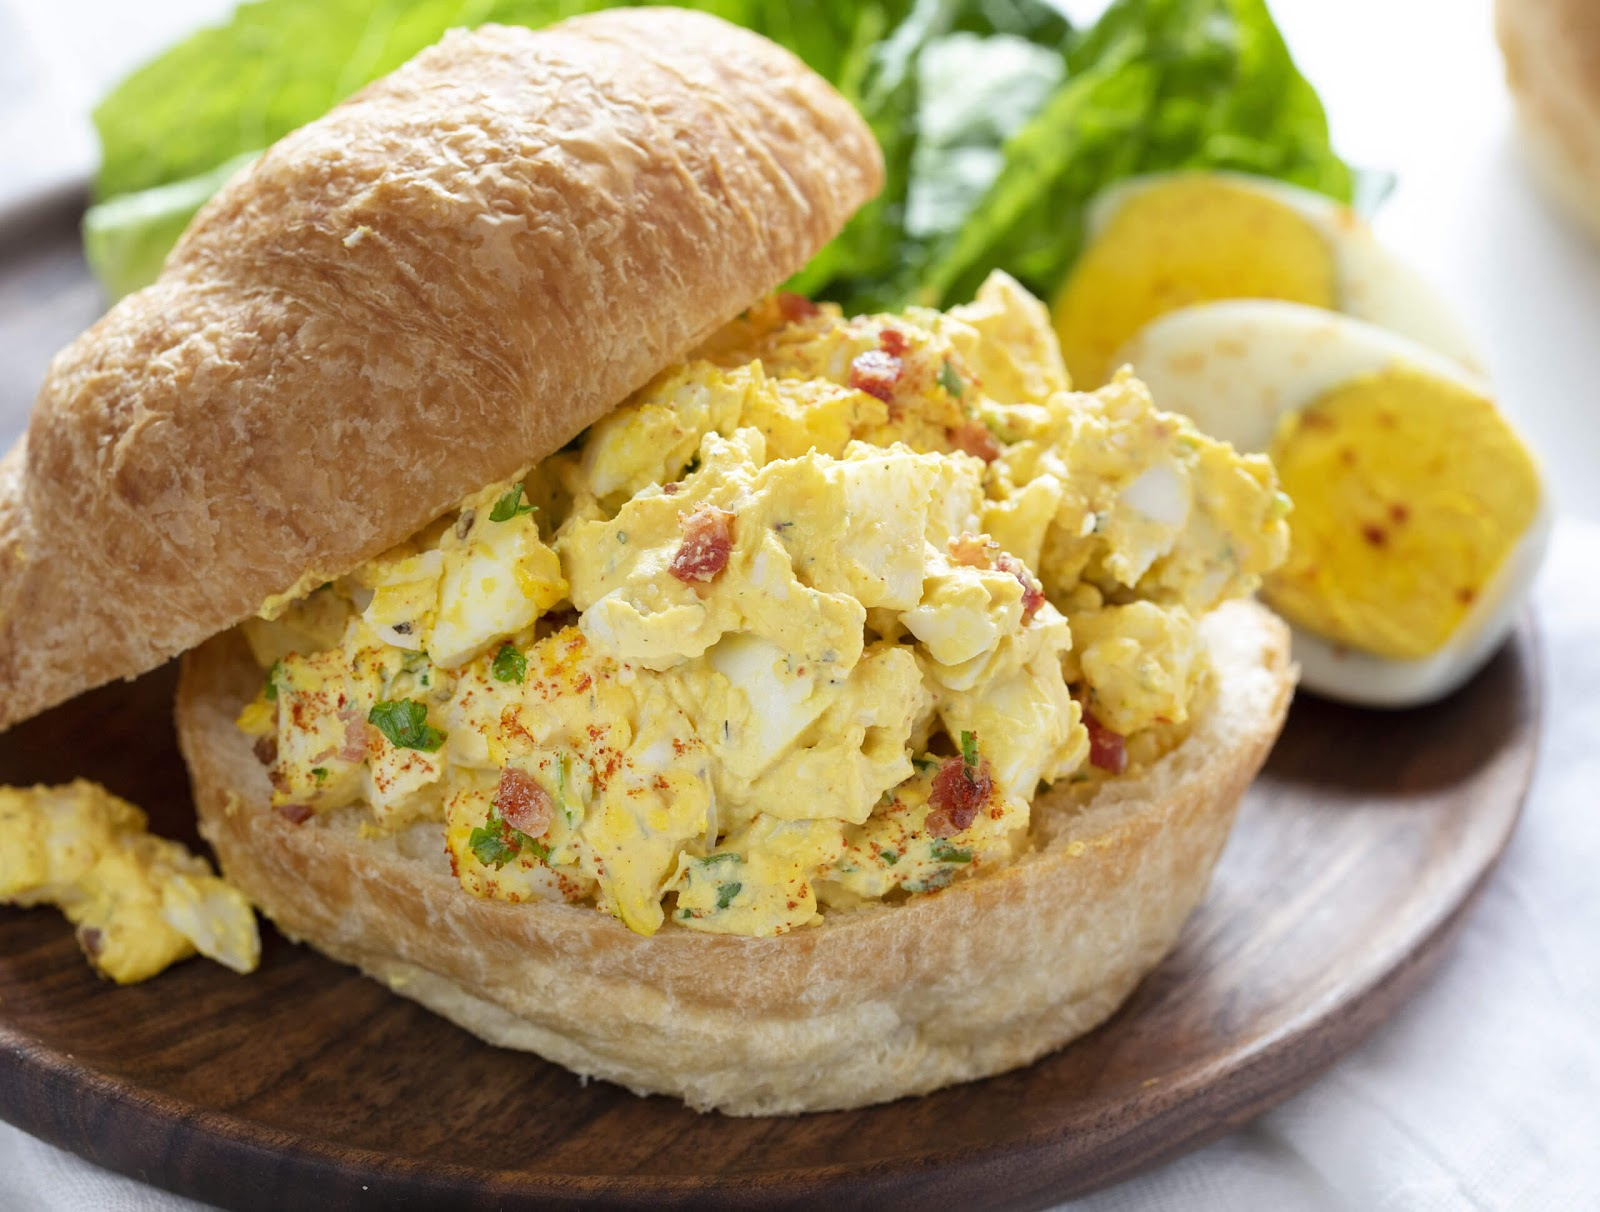 Deluxe Egg Salad recipe